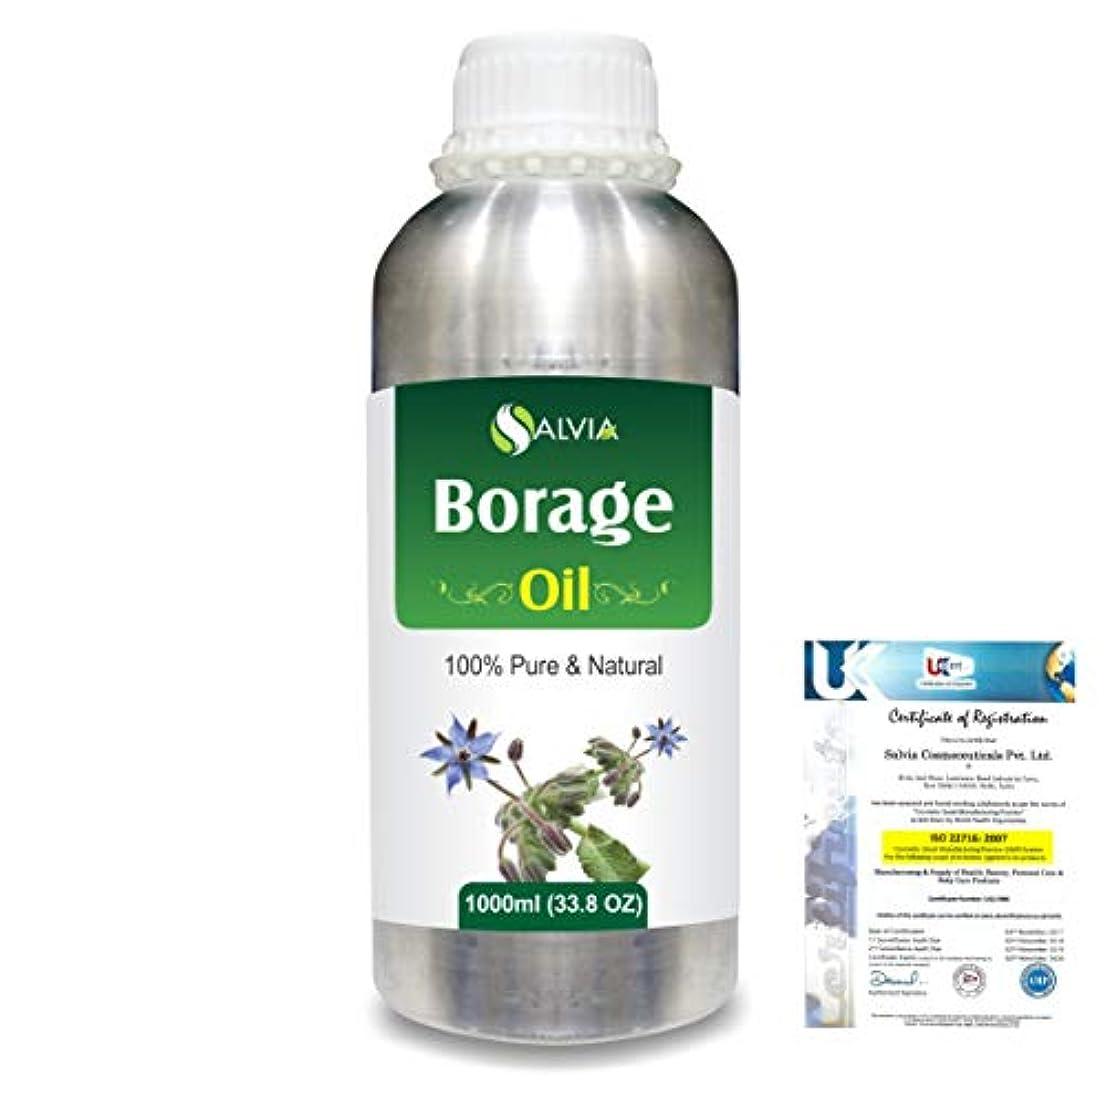 Borage (Borago officinalis) Natural Pure Undiluted Uncut Carrier Oil 1000ml/33.8 fl.oz.